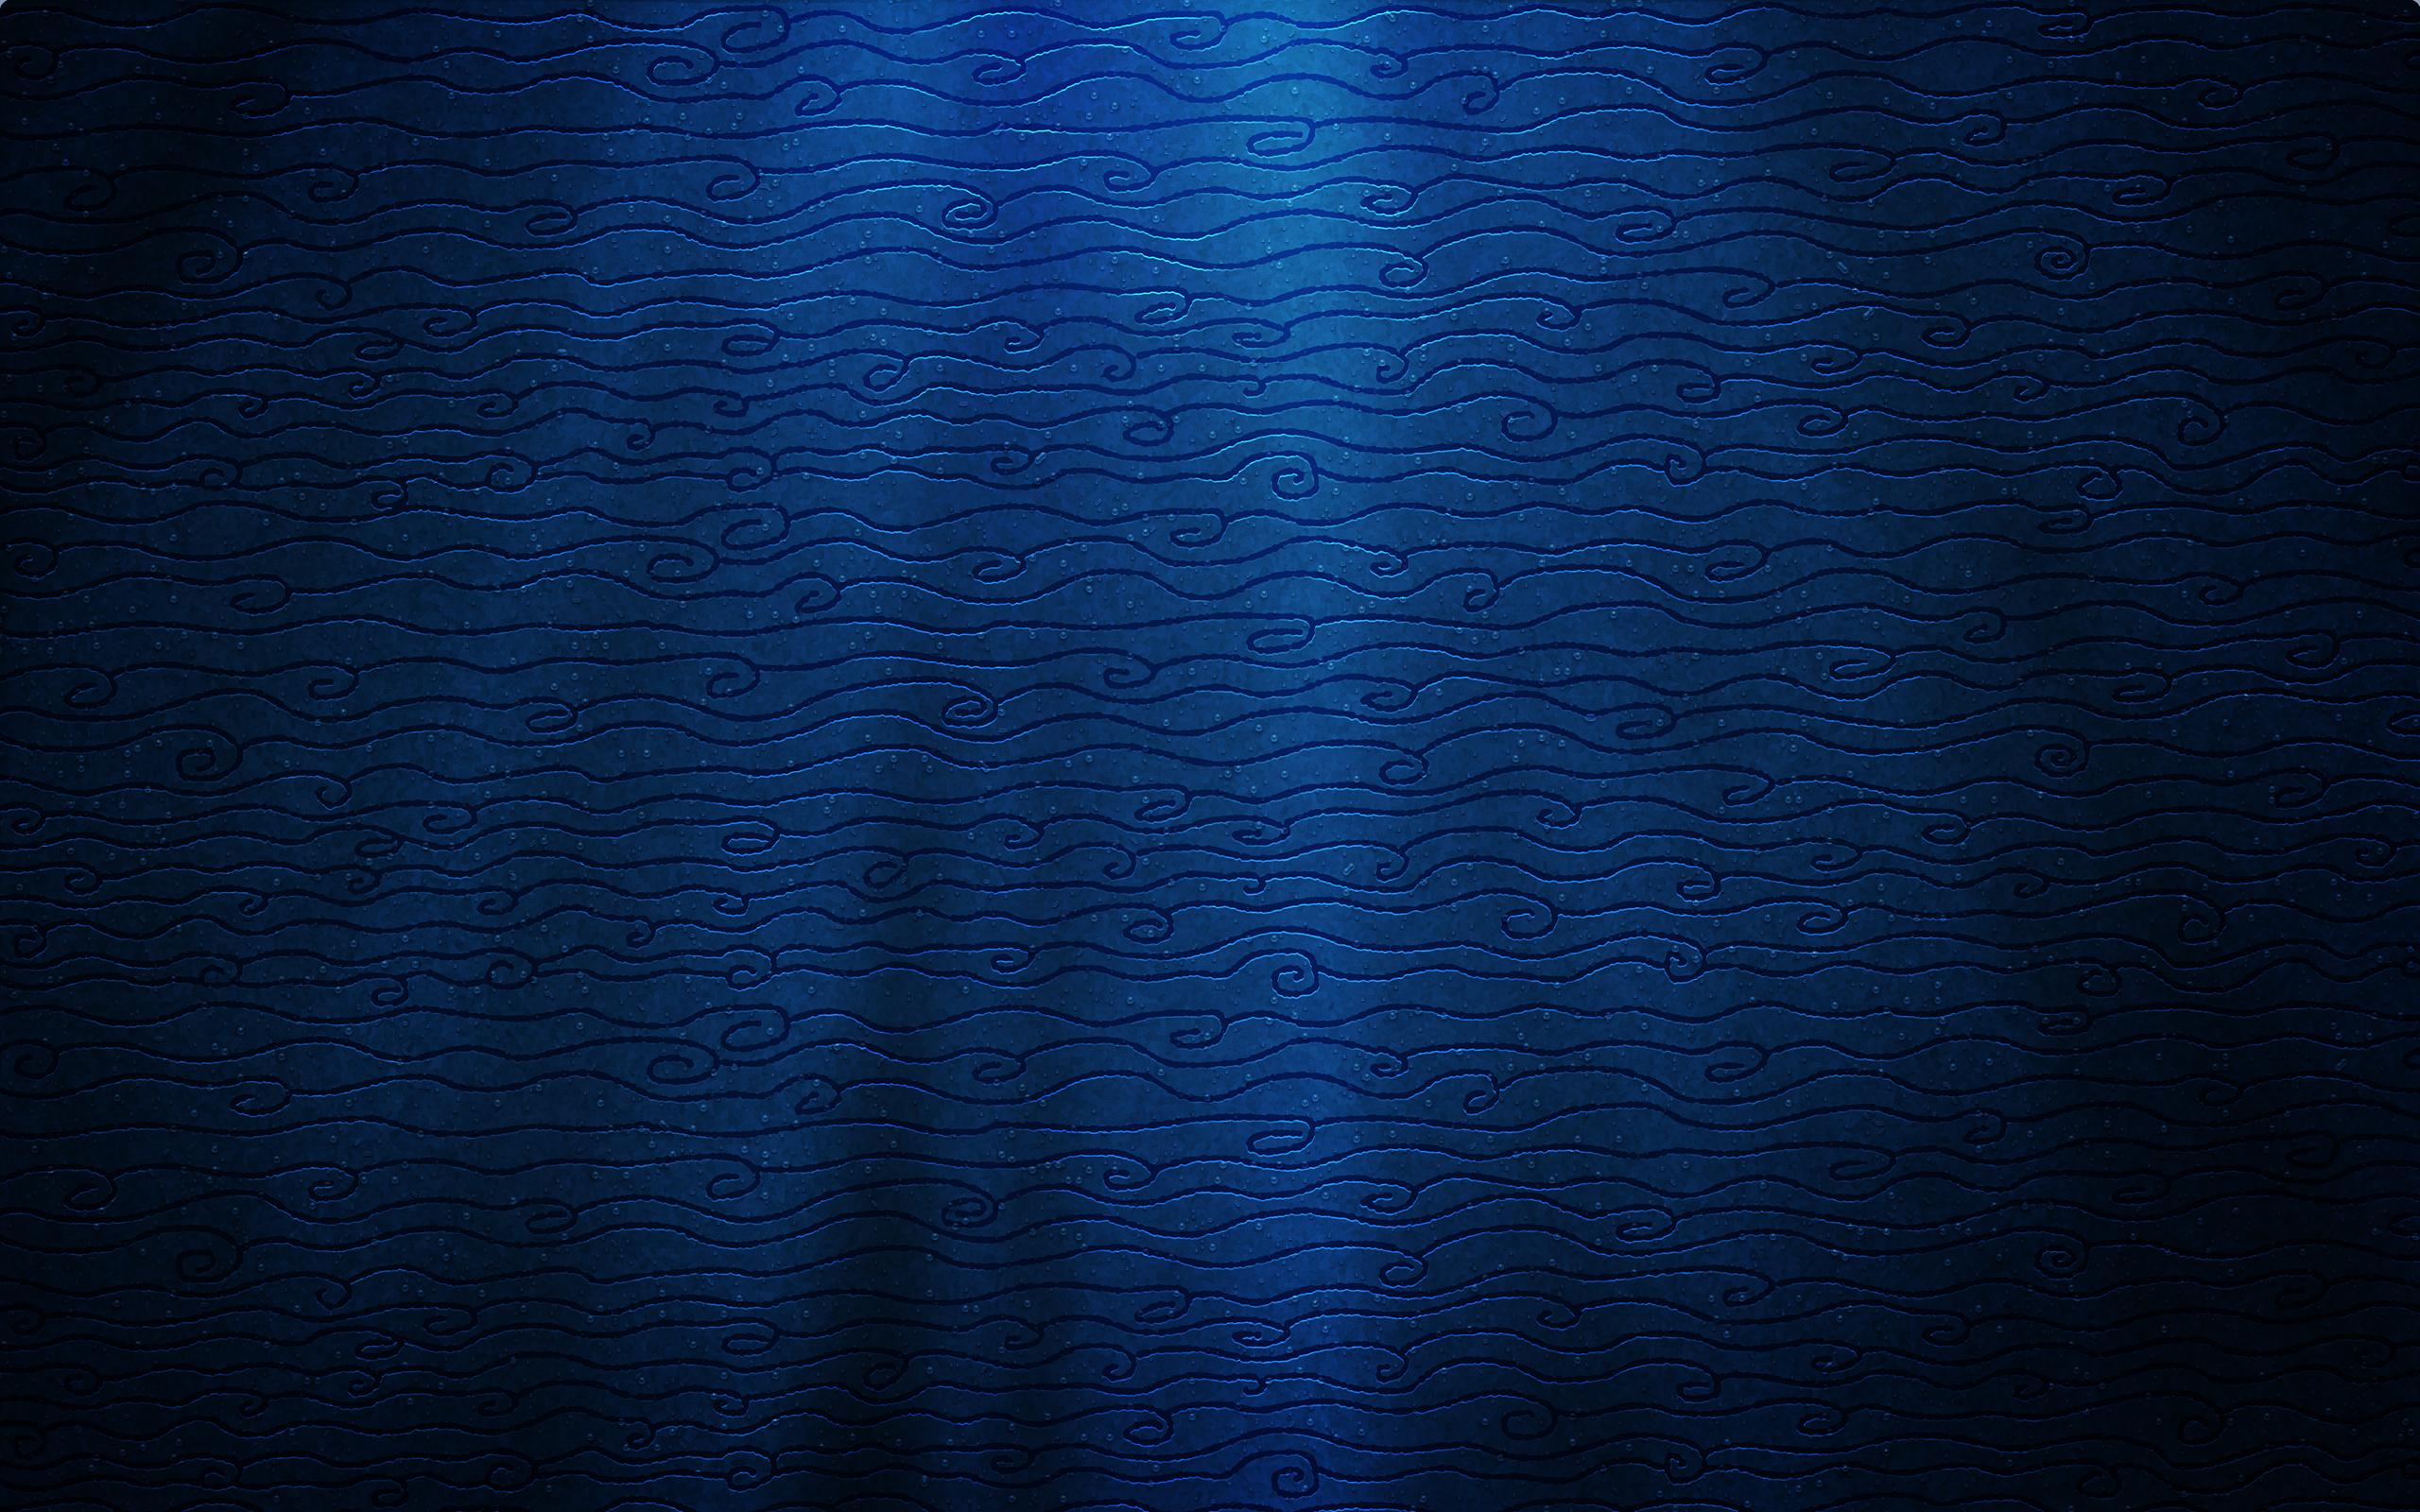 Blue Computer Wallpapers Desktop Backgrounds 2560x1600 ID86718 2560x1600